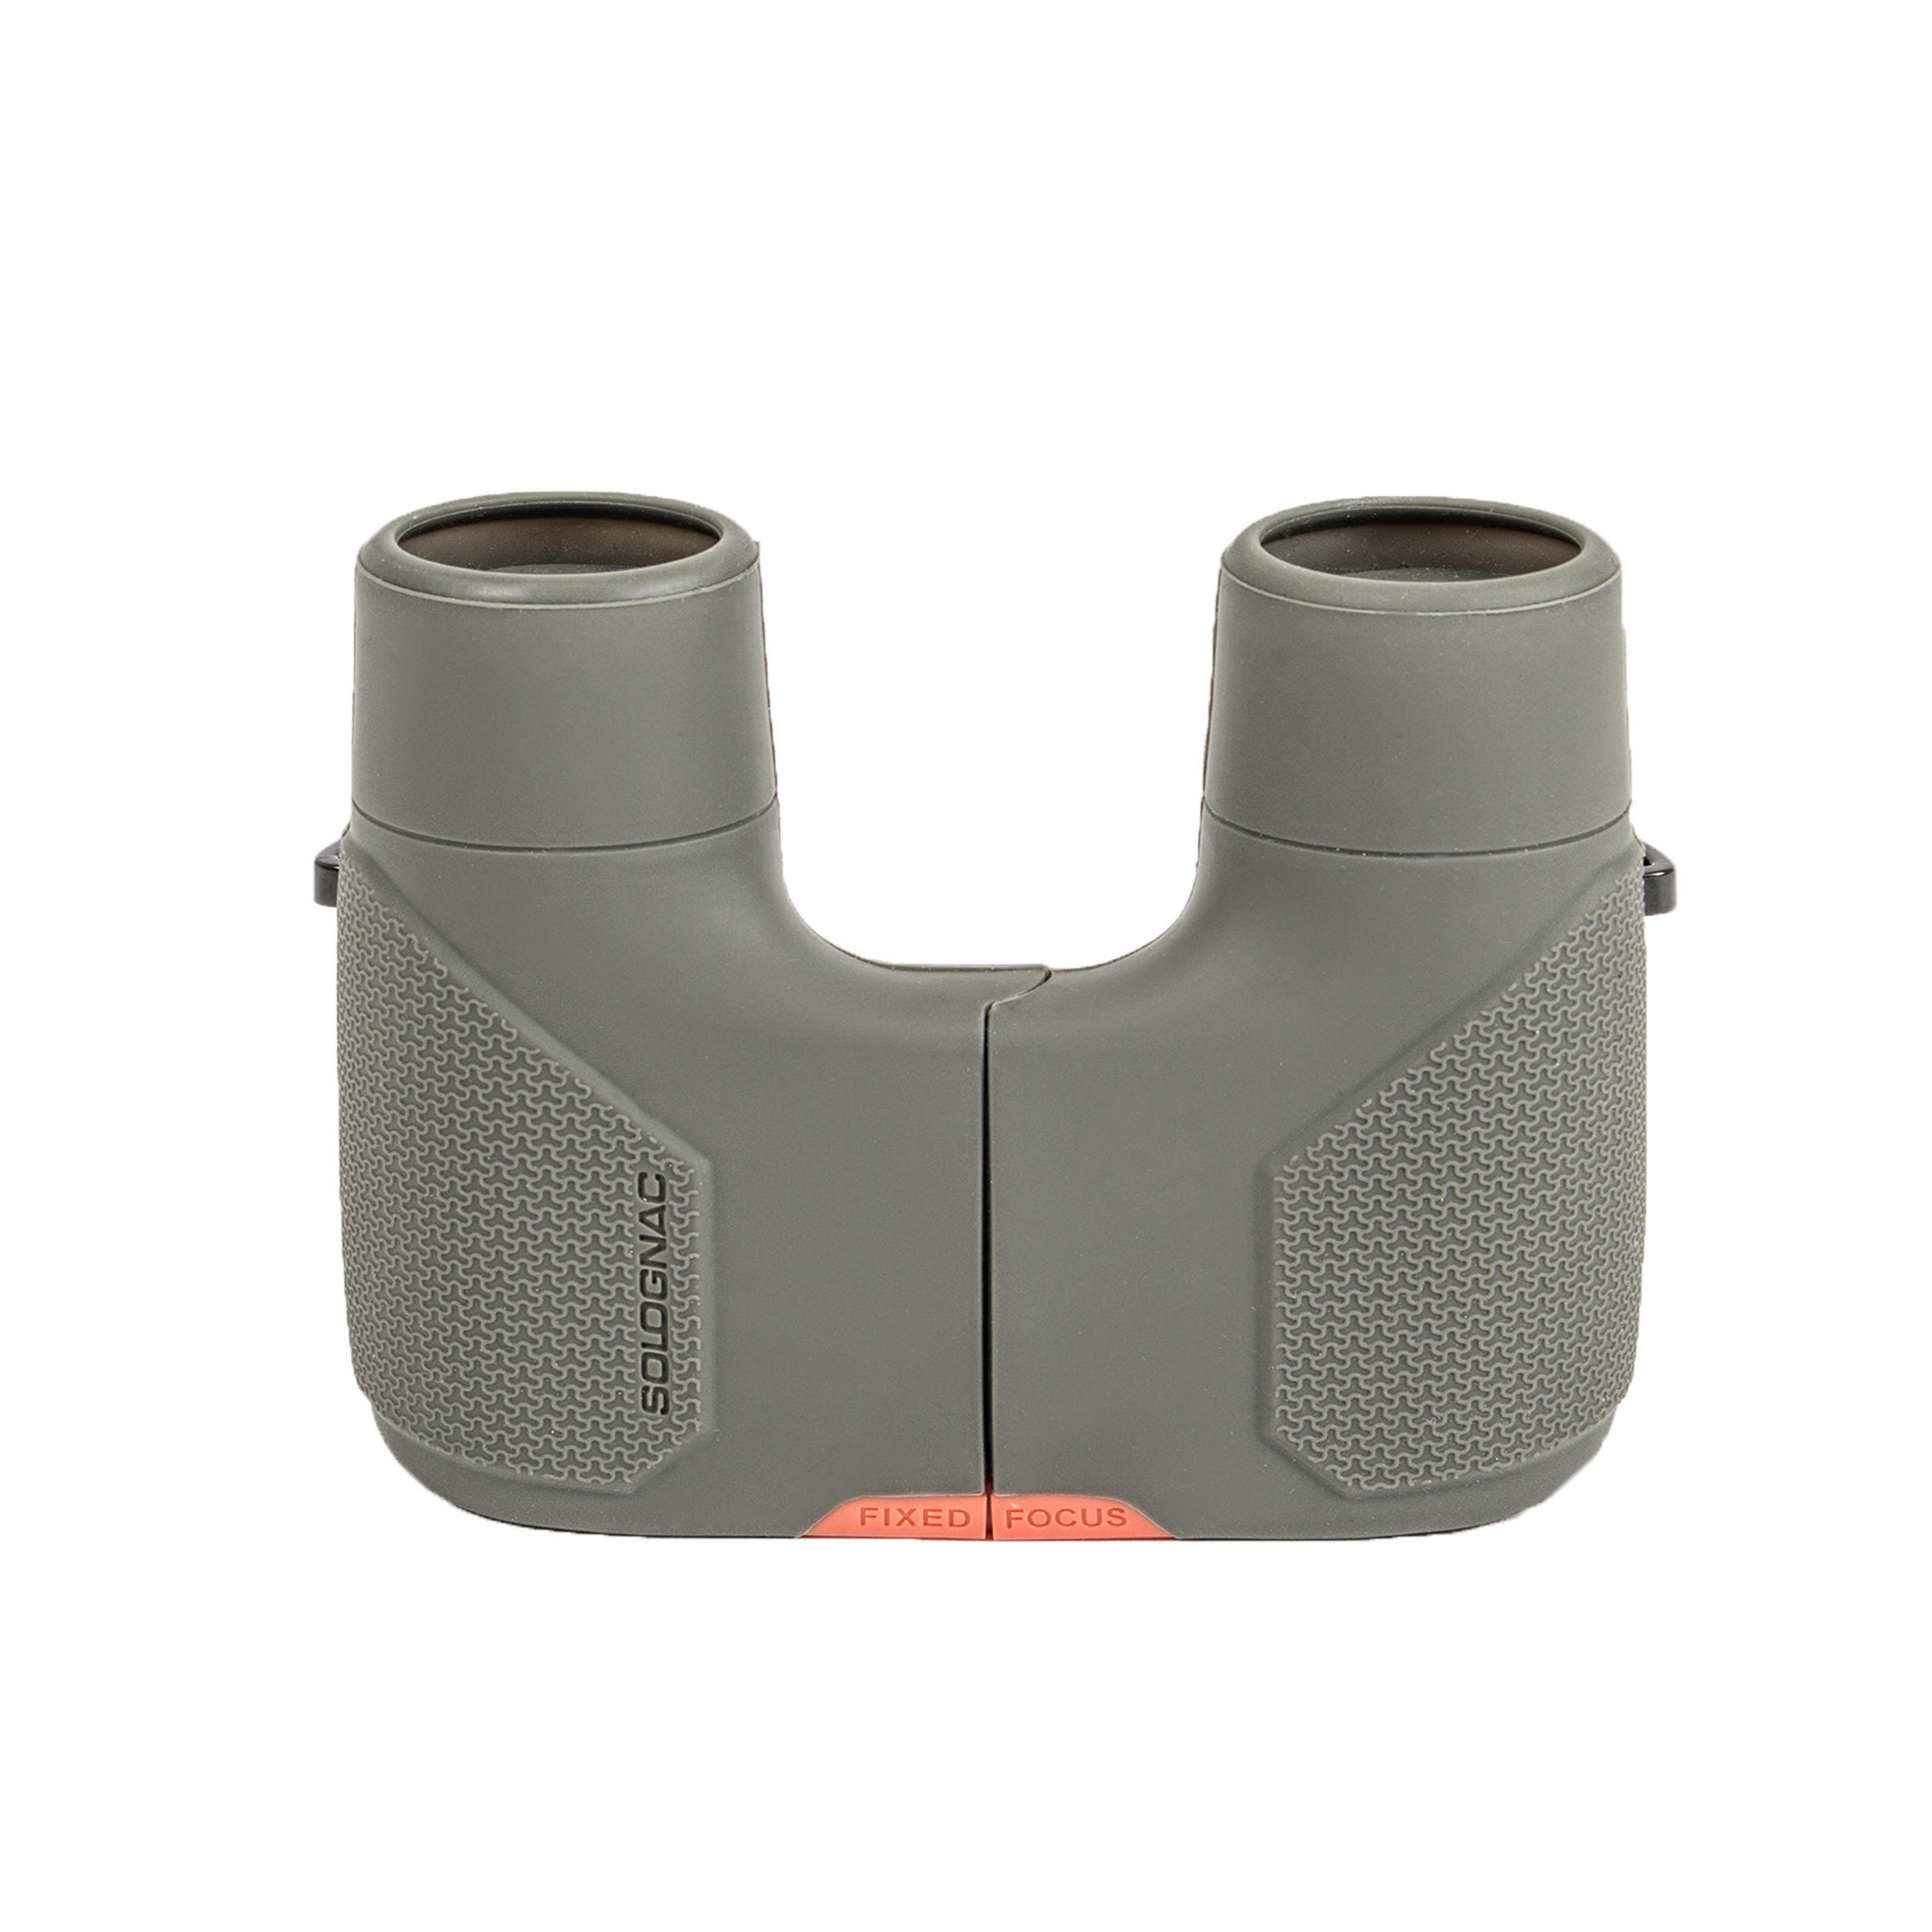 Wildlife Binoculars 8x25 Fixed Focus